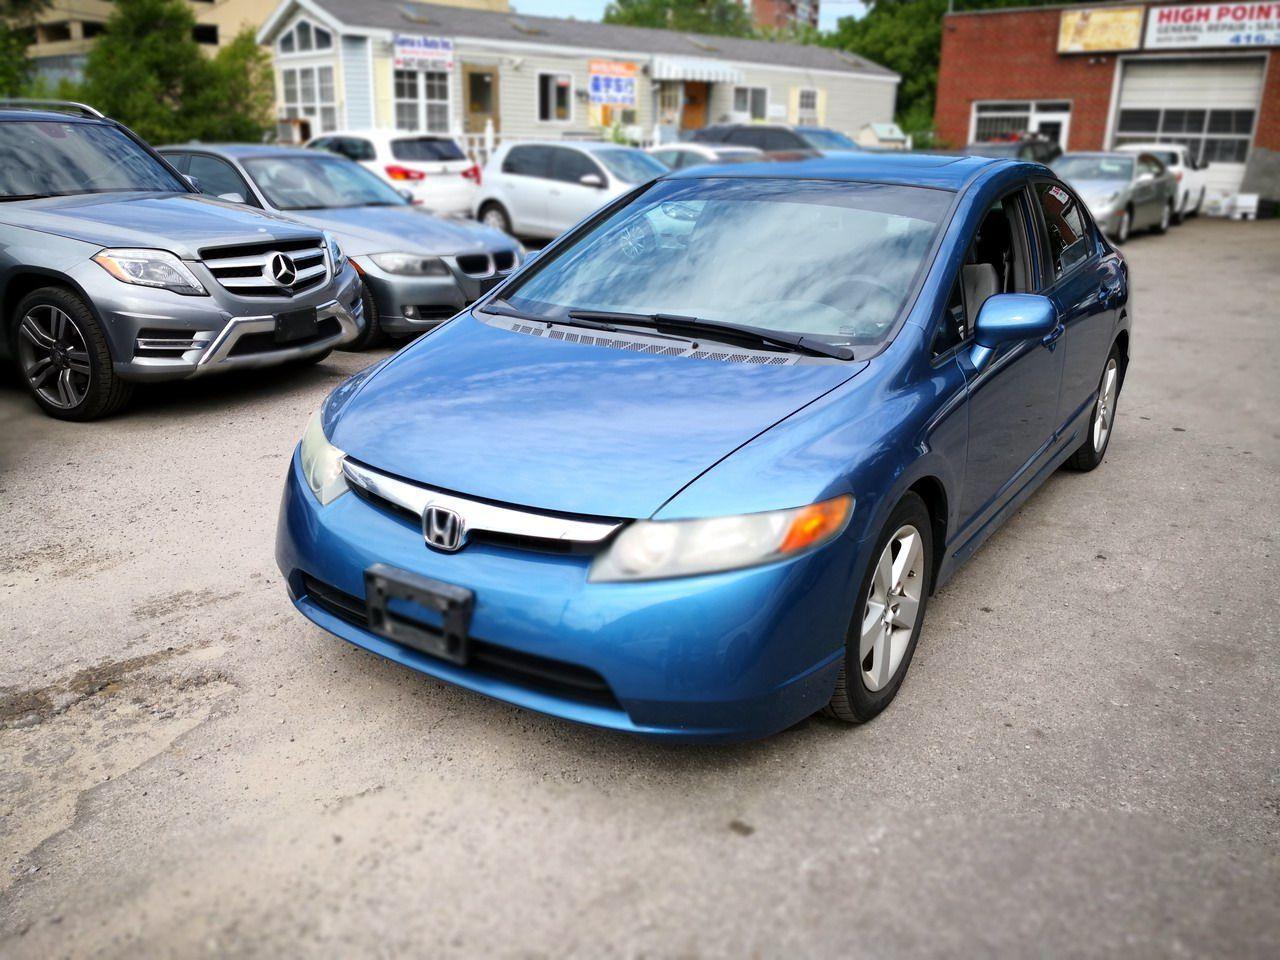 Photo of Blue 2007 Honda Civic